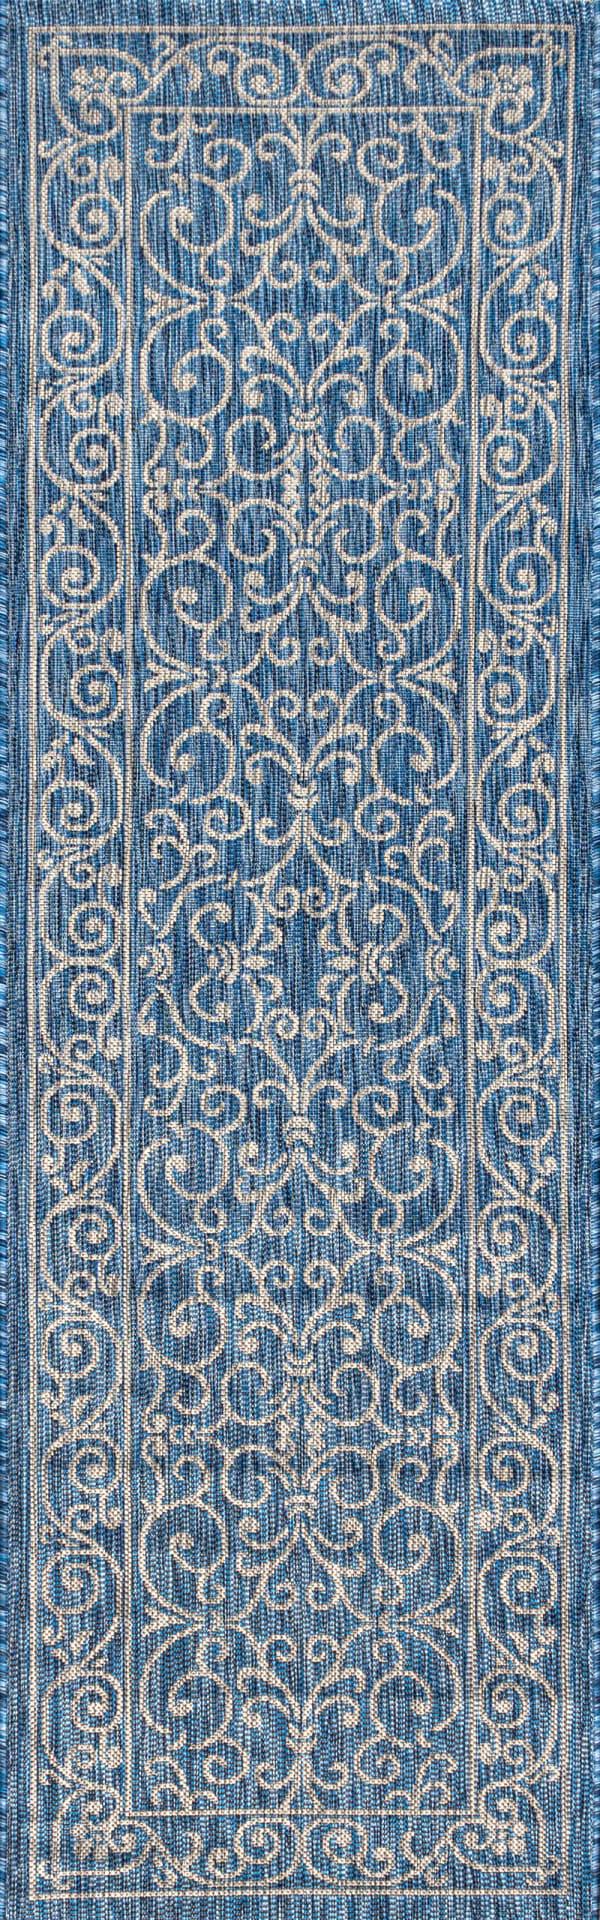 Charleston Vintage Filigree Textu Weave Blue and Gray Outdoor Runner Rug